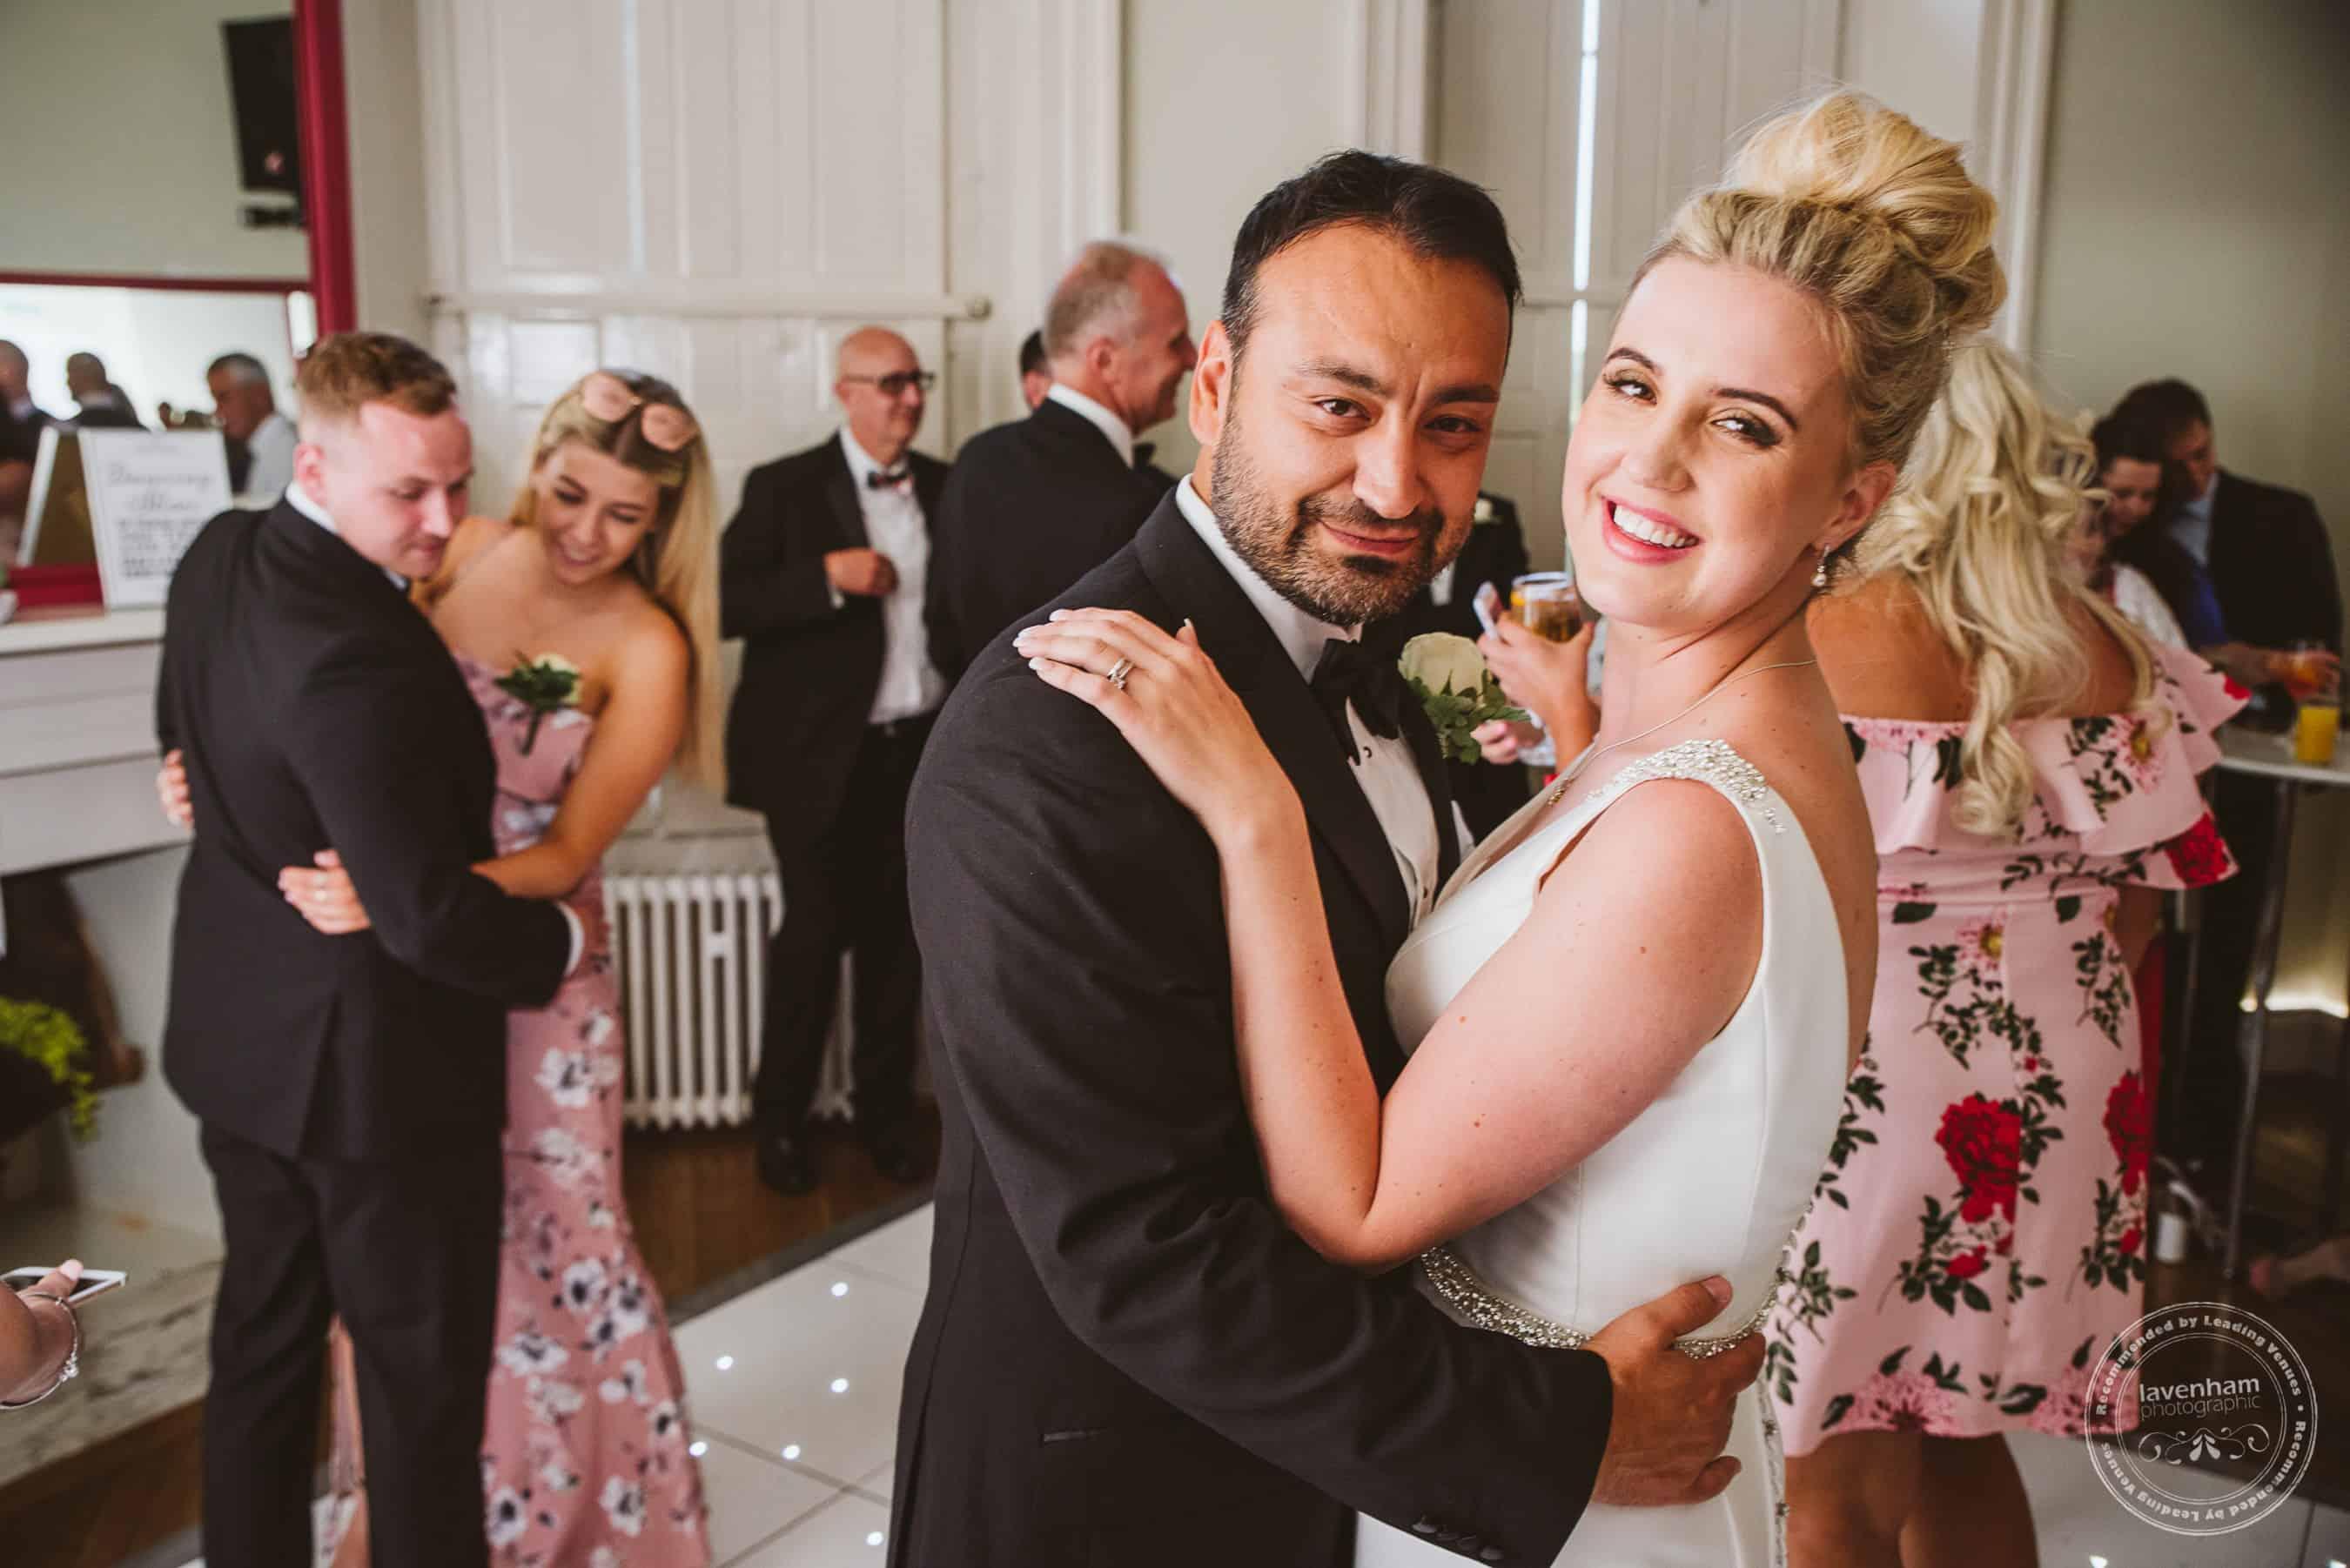 220618 Gosfield Hall Wedding Photography Lavenham Photographic 0168